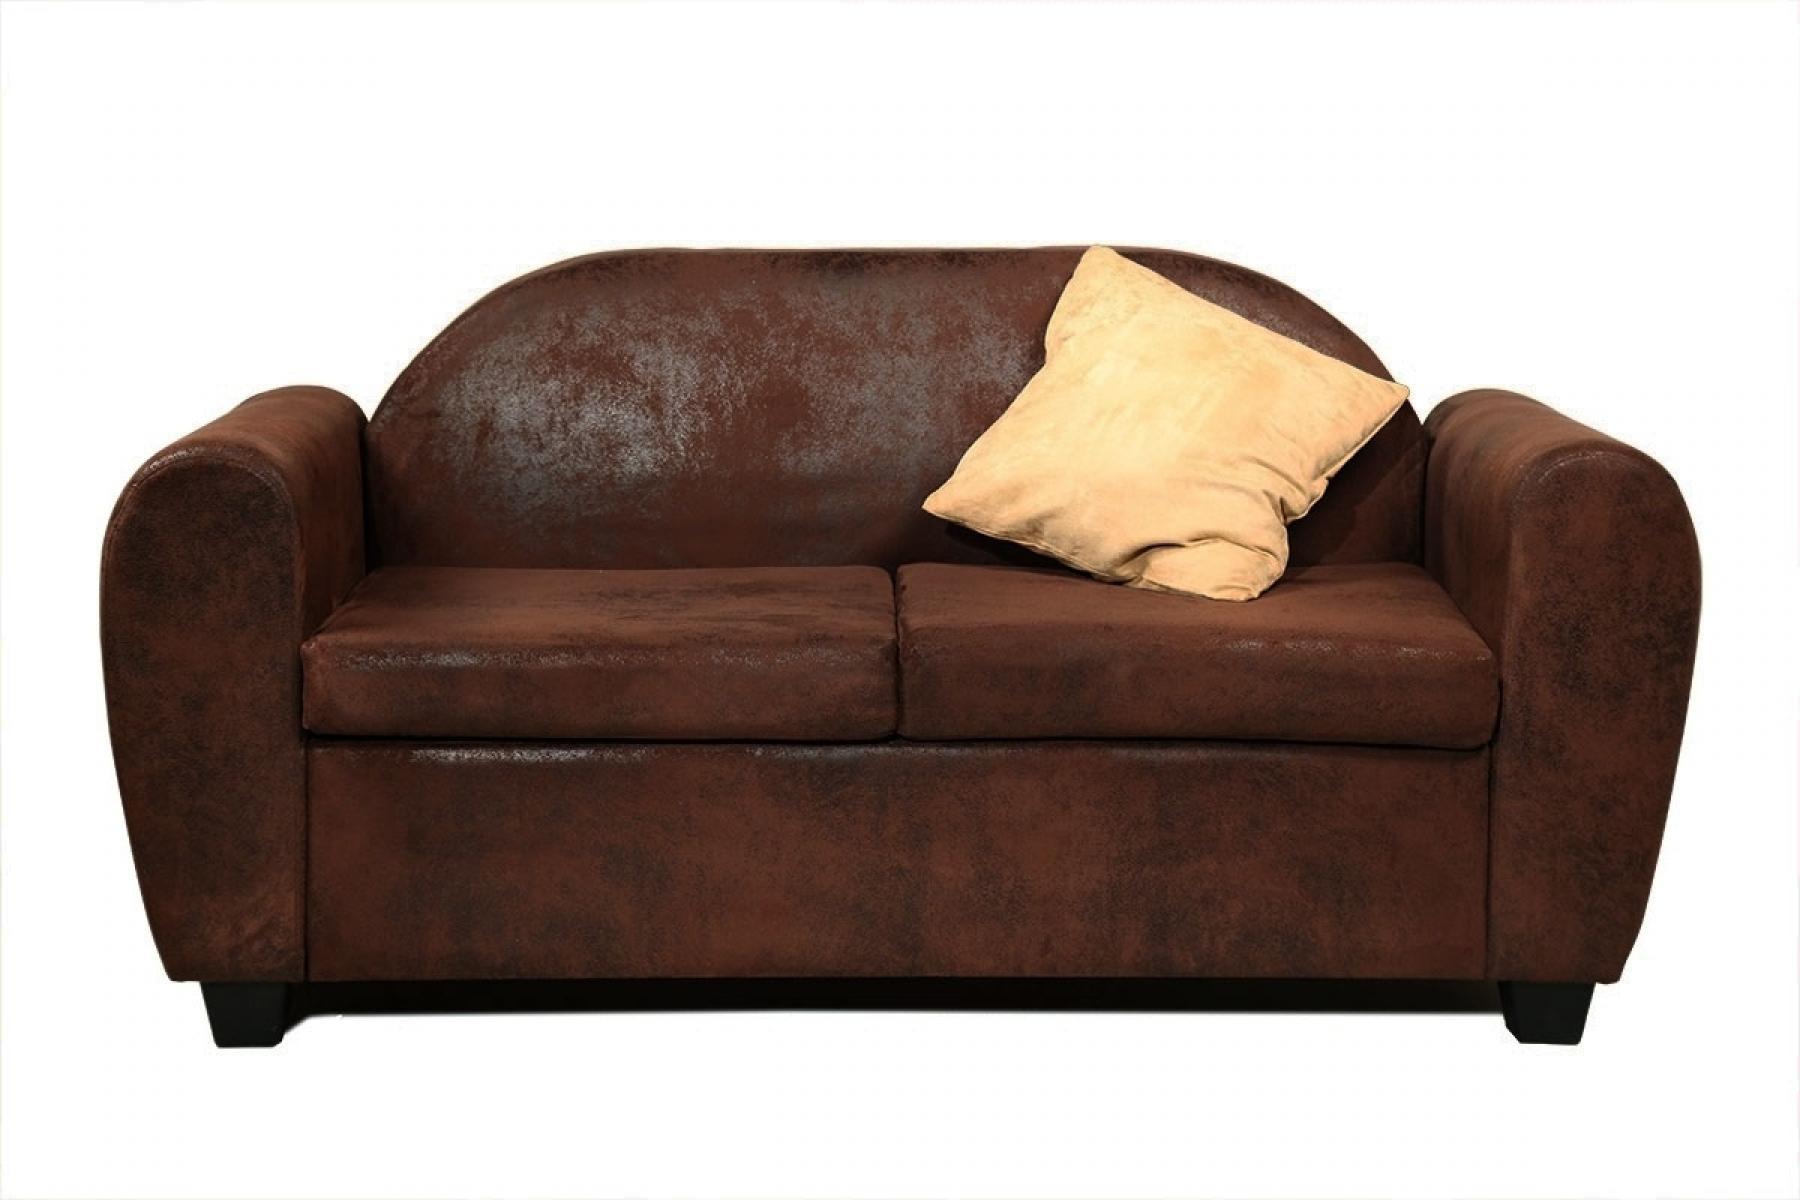 photos canap convertible cuir marron vieilli. Black Bedroom Furniture Sets. Home Design Ideas